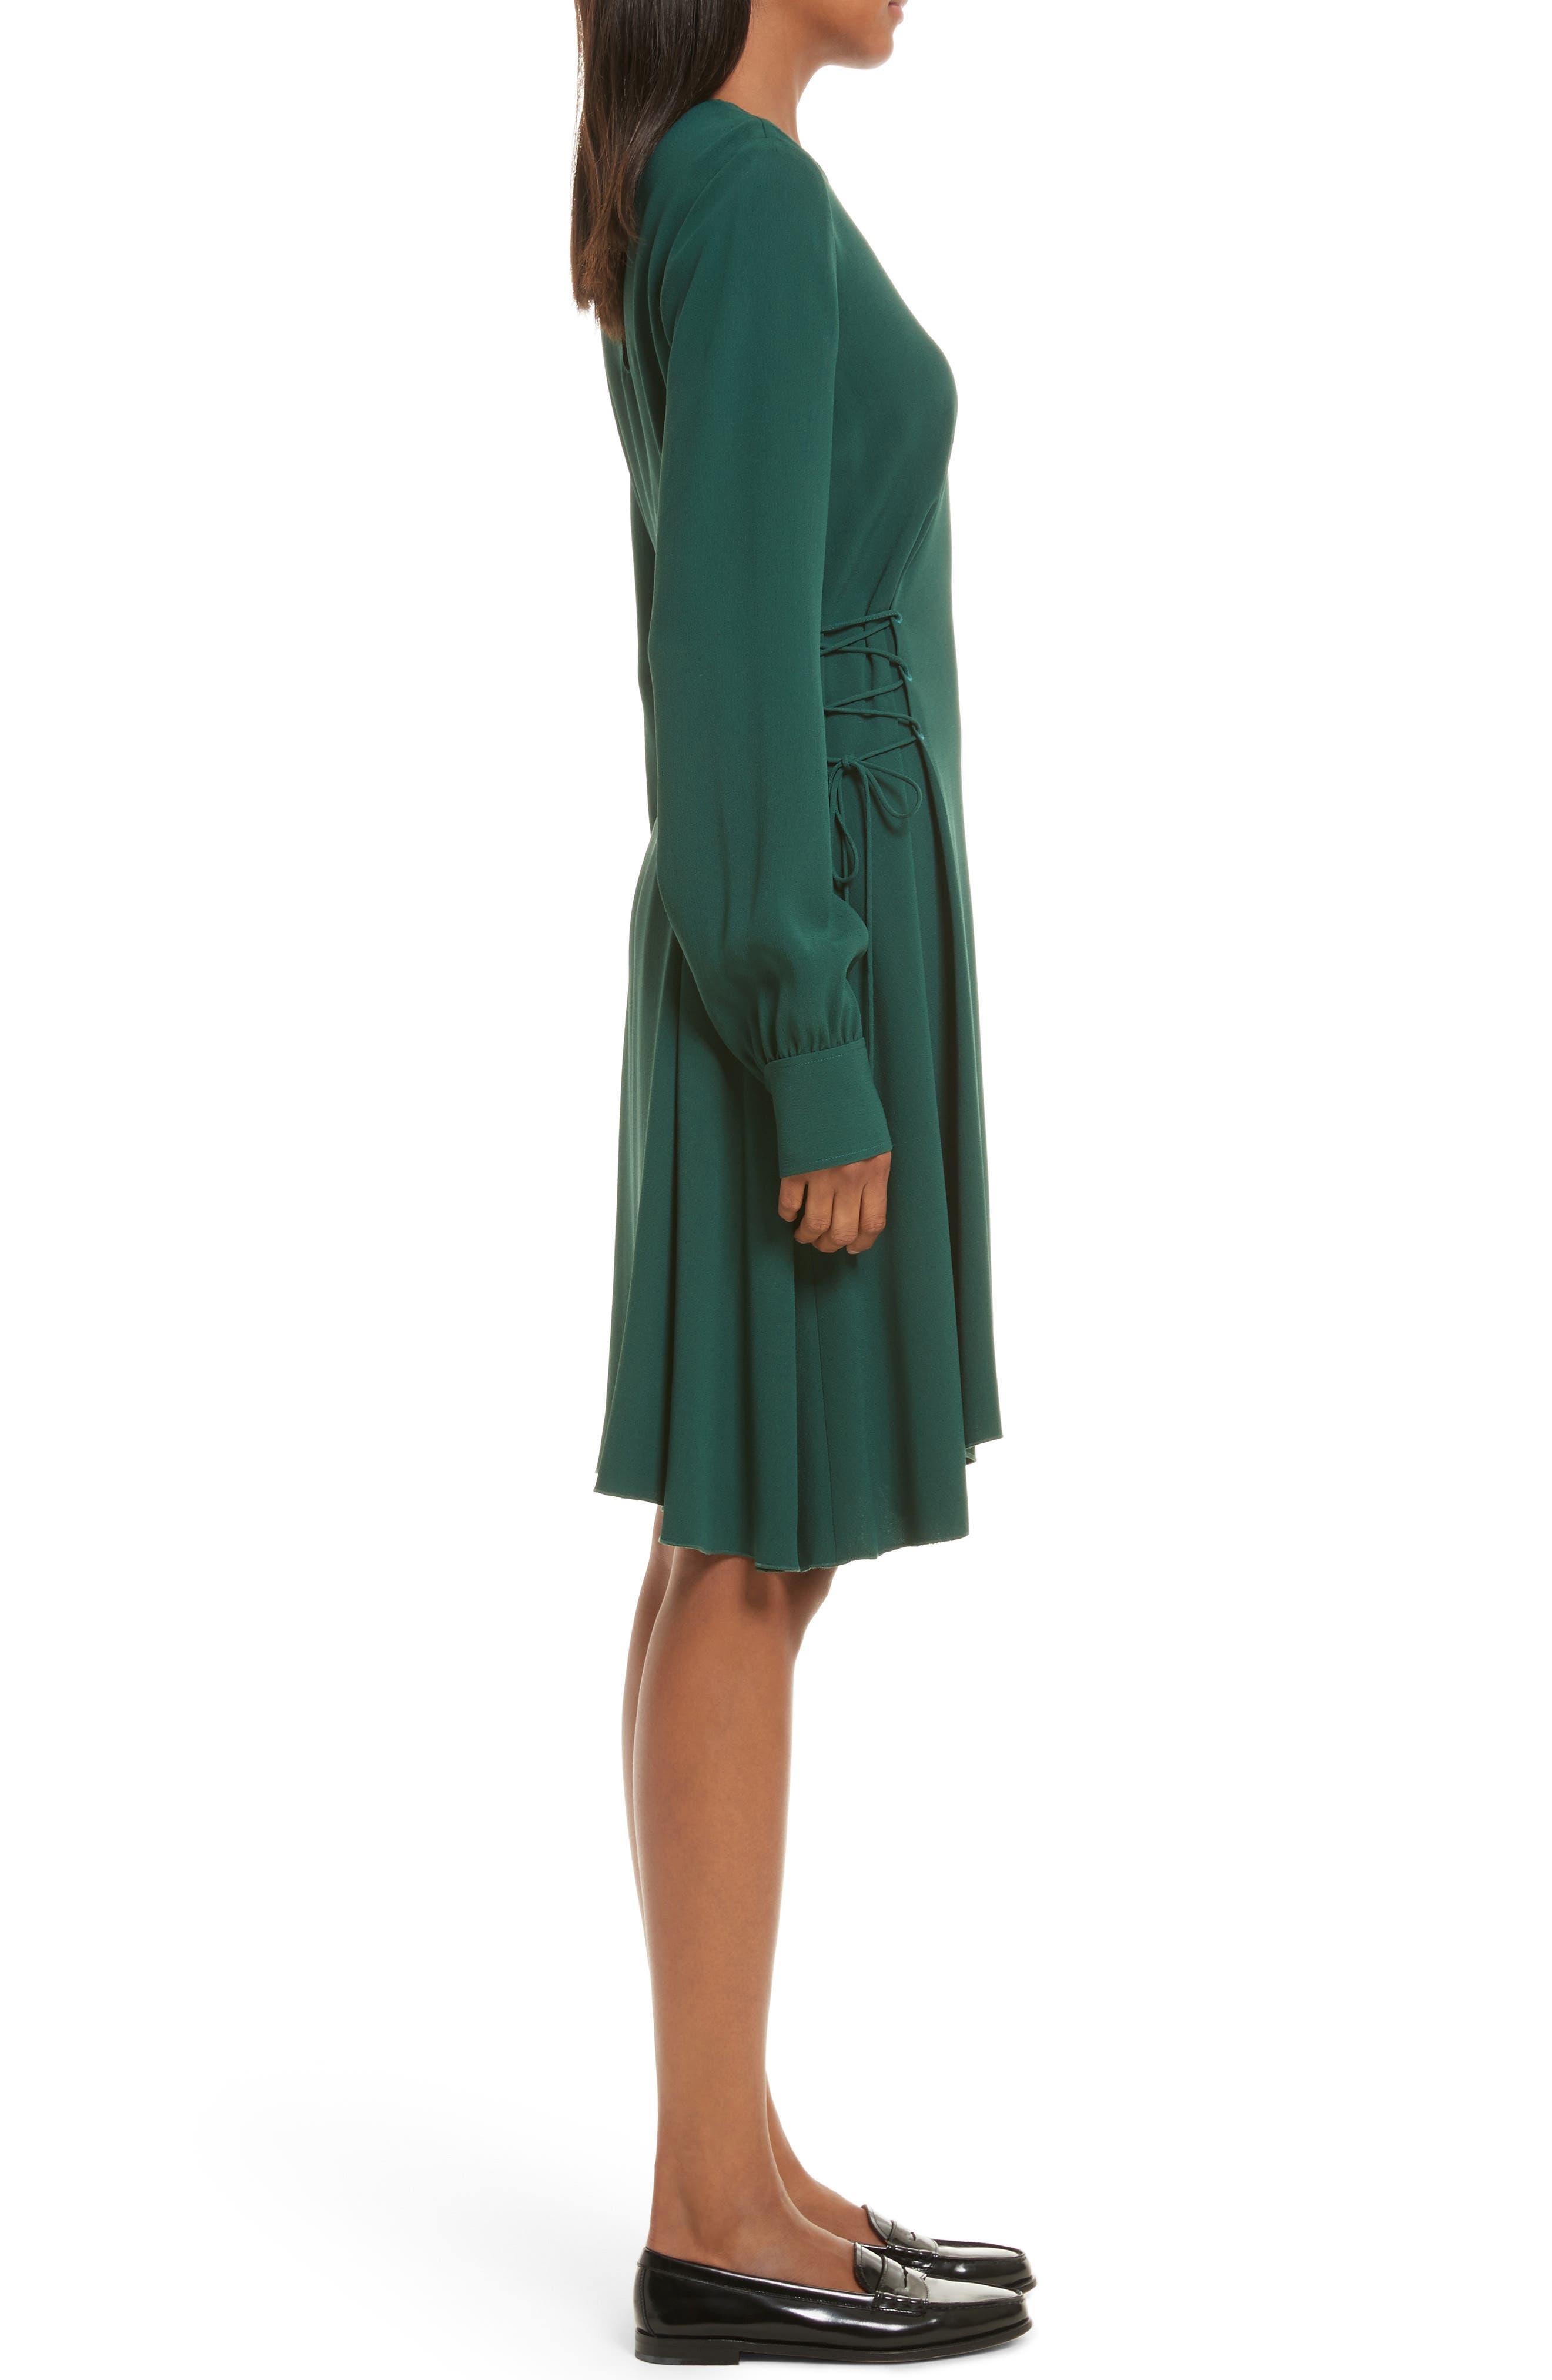 Kensington Lace-Up A-Line Dress,                             Alternate thumbnail 3, color,                             Bright Hunter